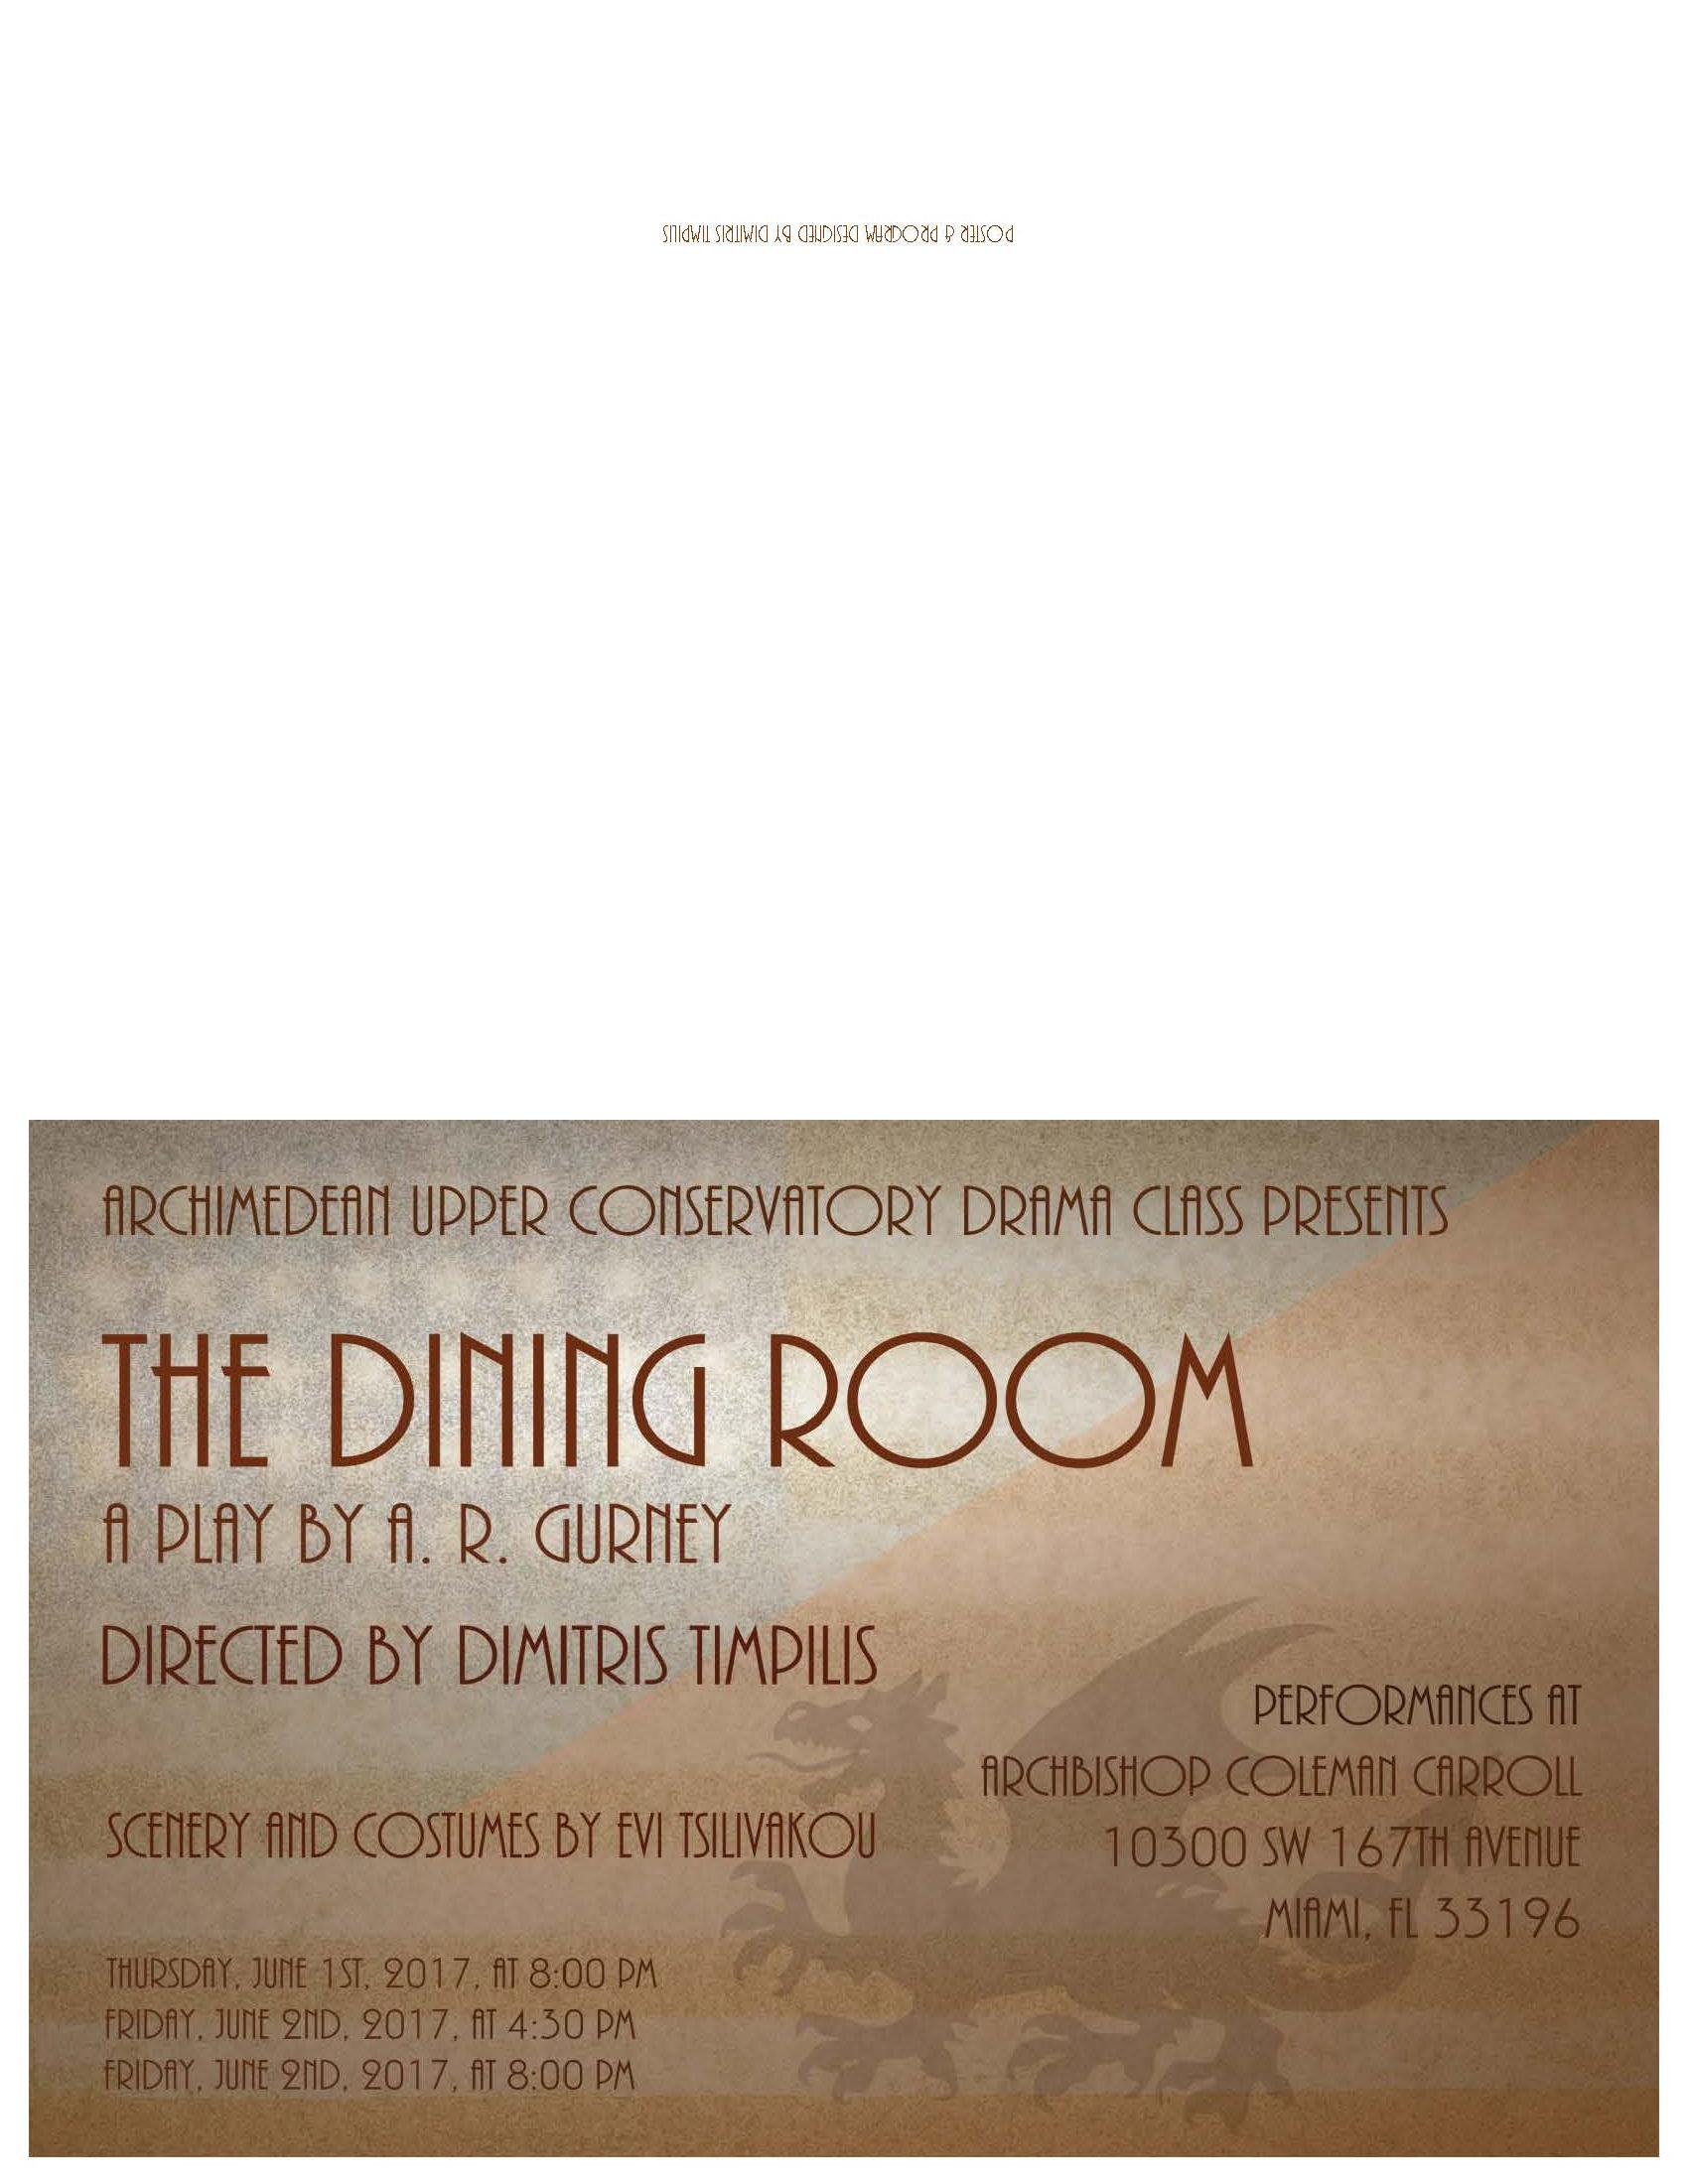 2017 The Dining Room by A. R. Gurney Jr. Program A.jpg